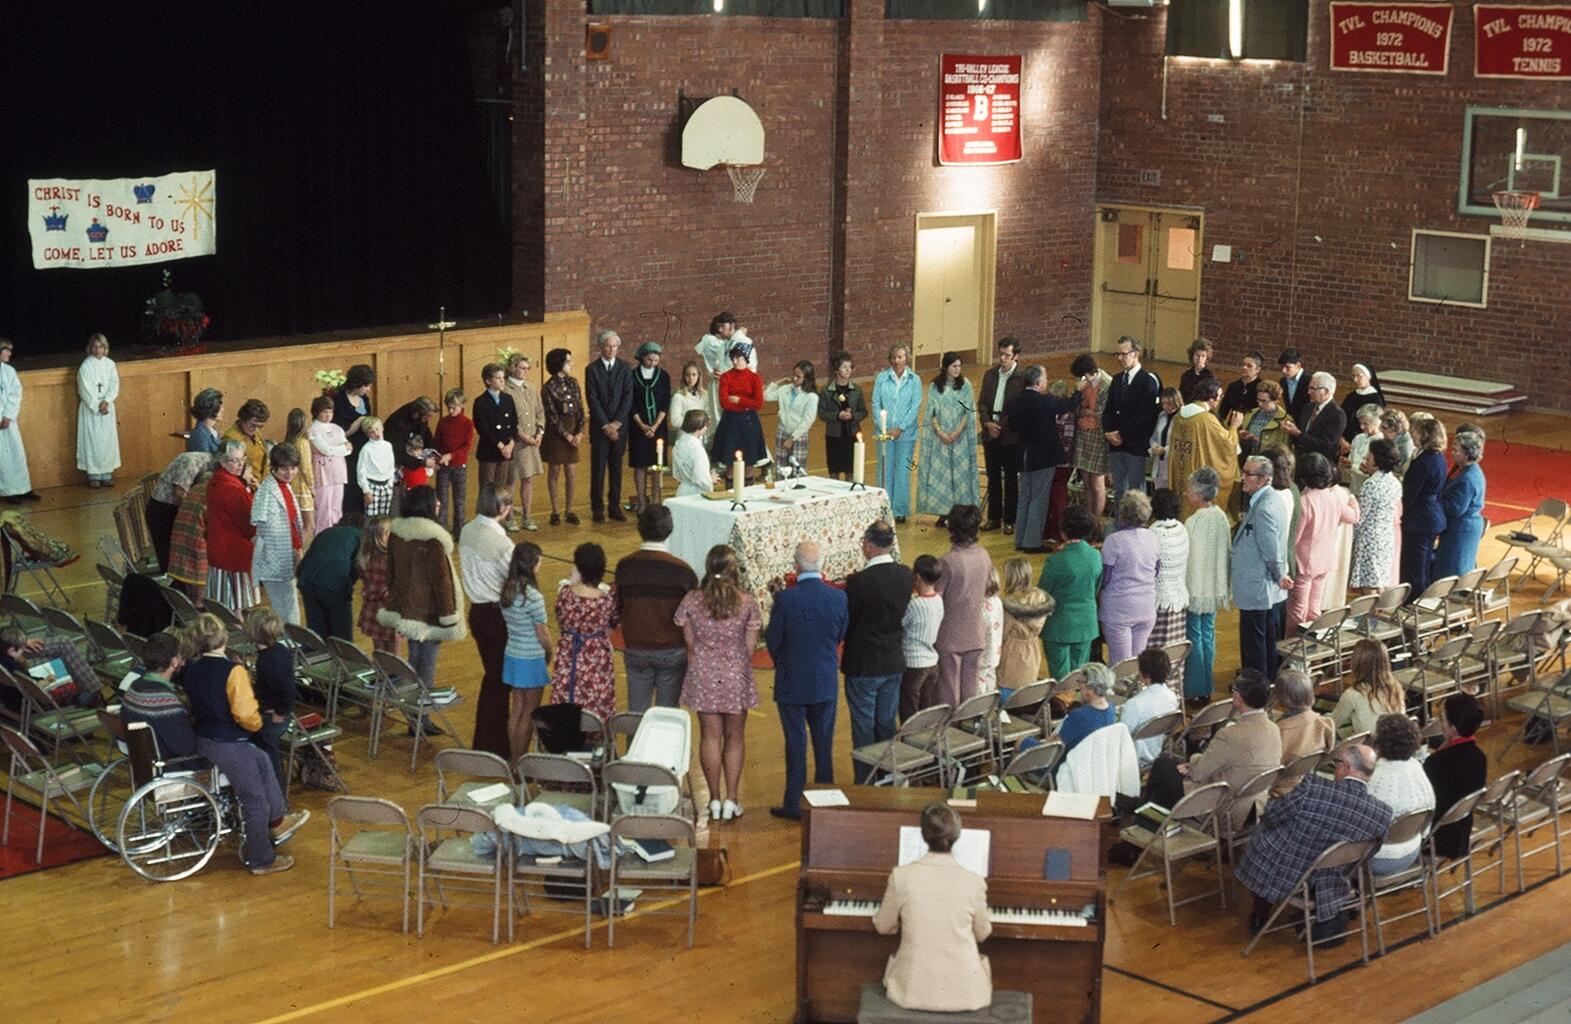 Worshiping in the high school gymnasium ca. 1973